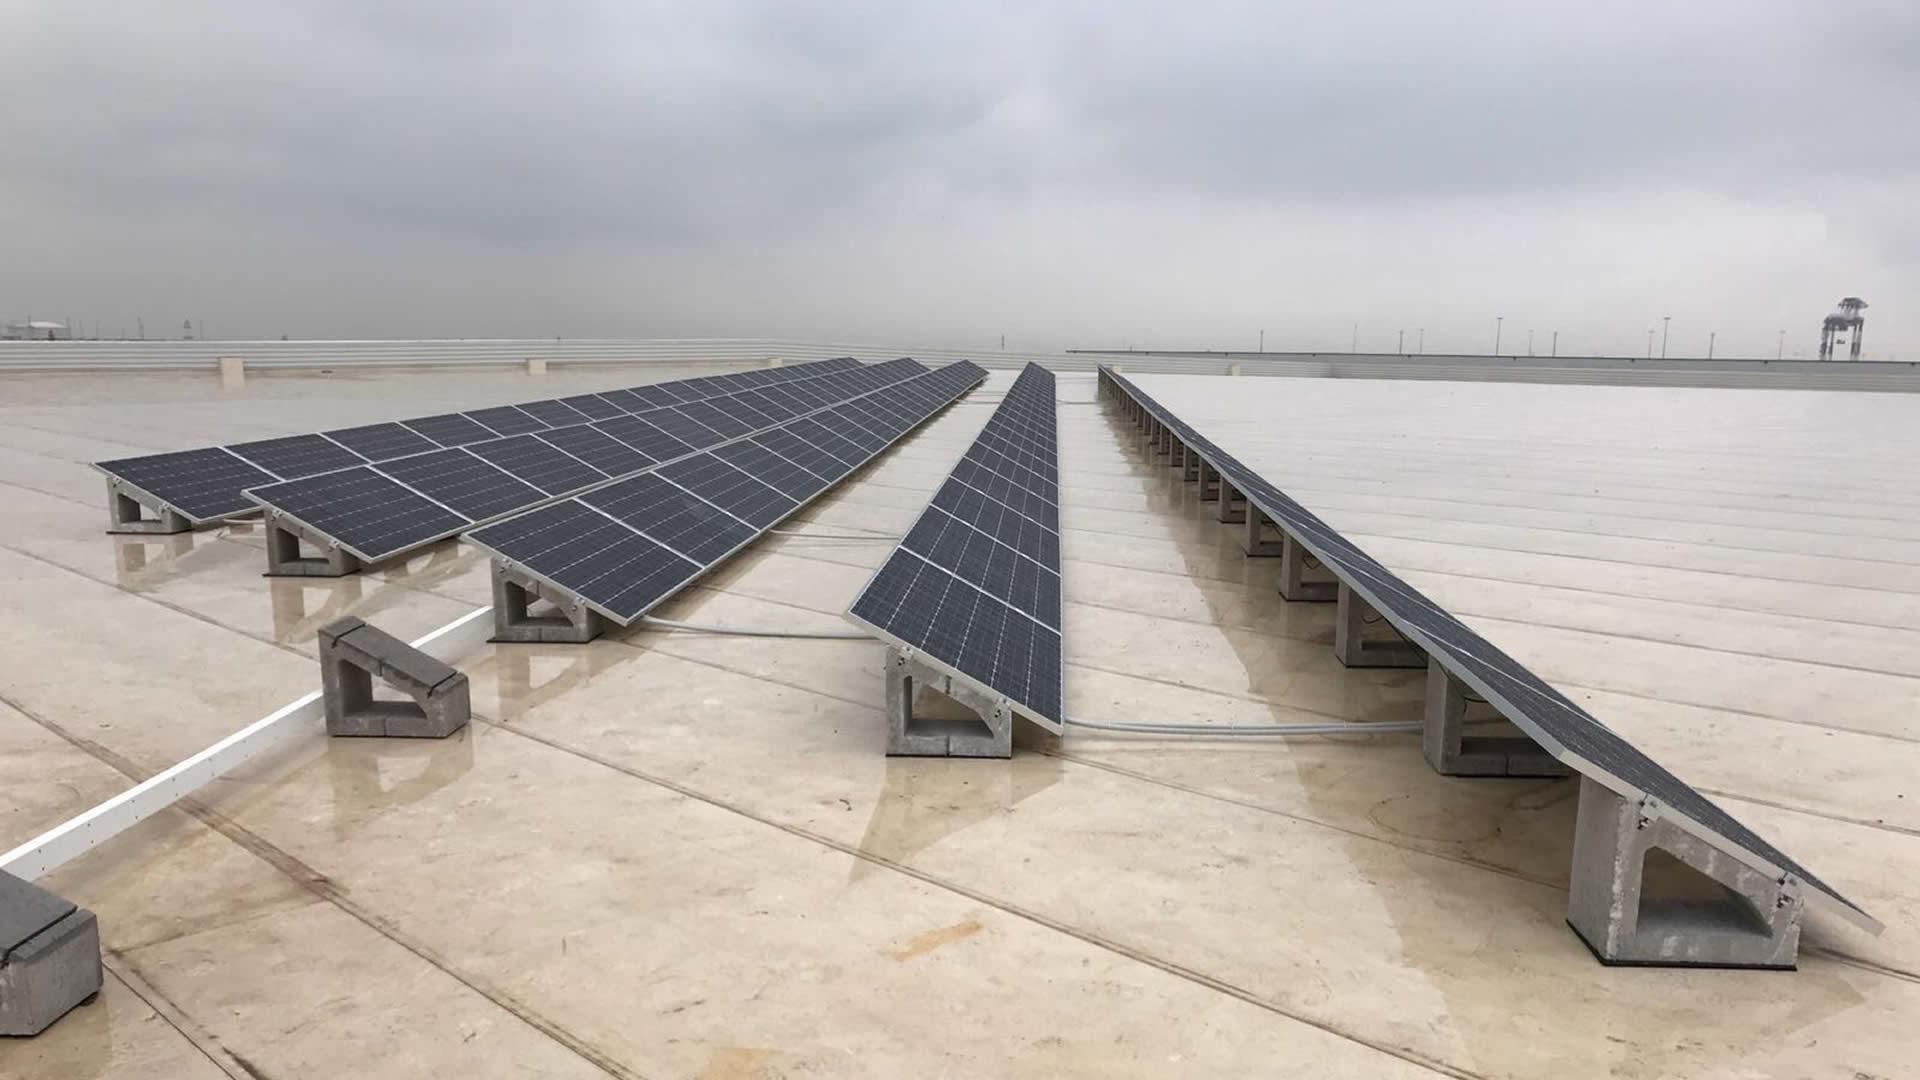 Instalaci n de energ a solar fotovoltaica en dhl barcelona - Solar barcelona ...